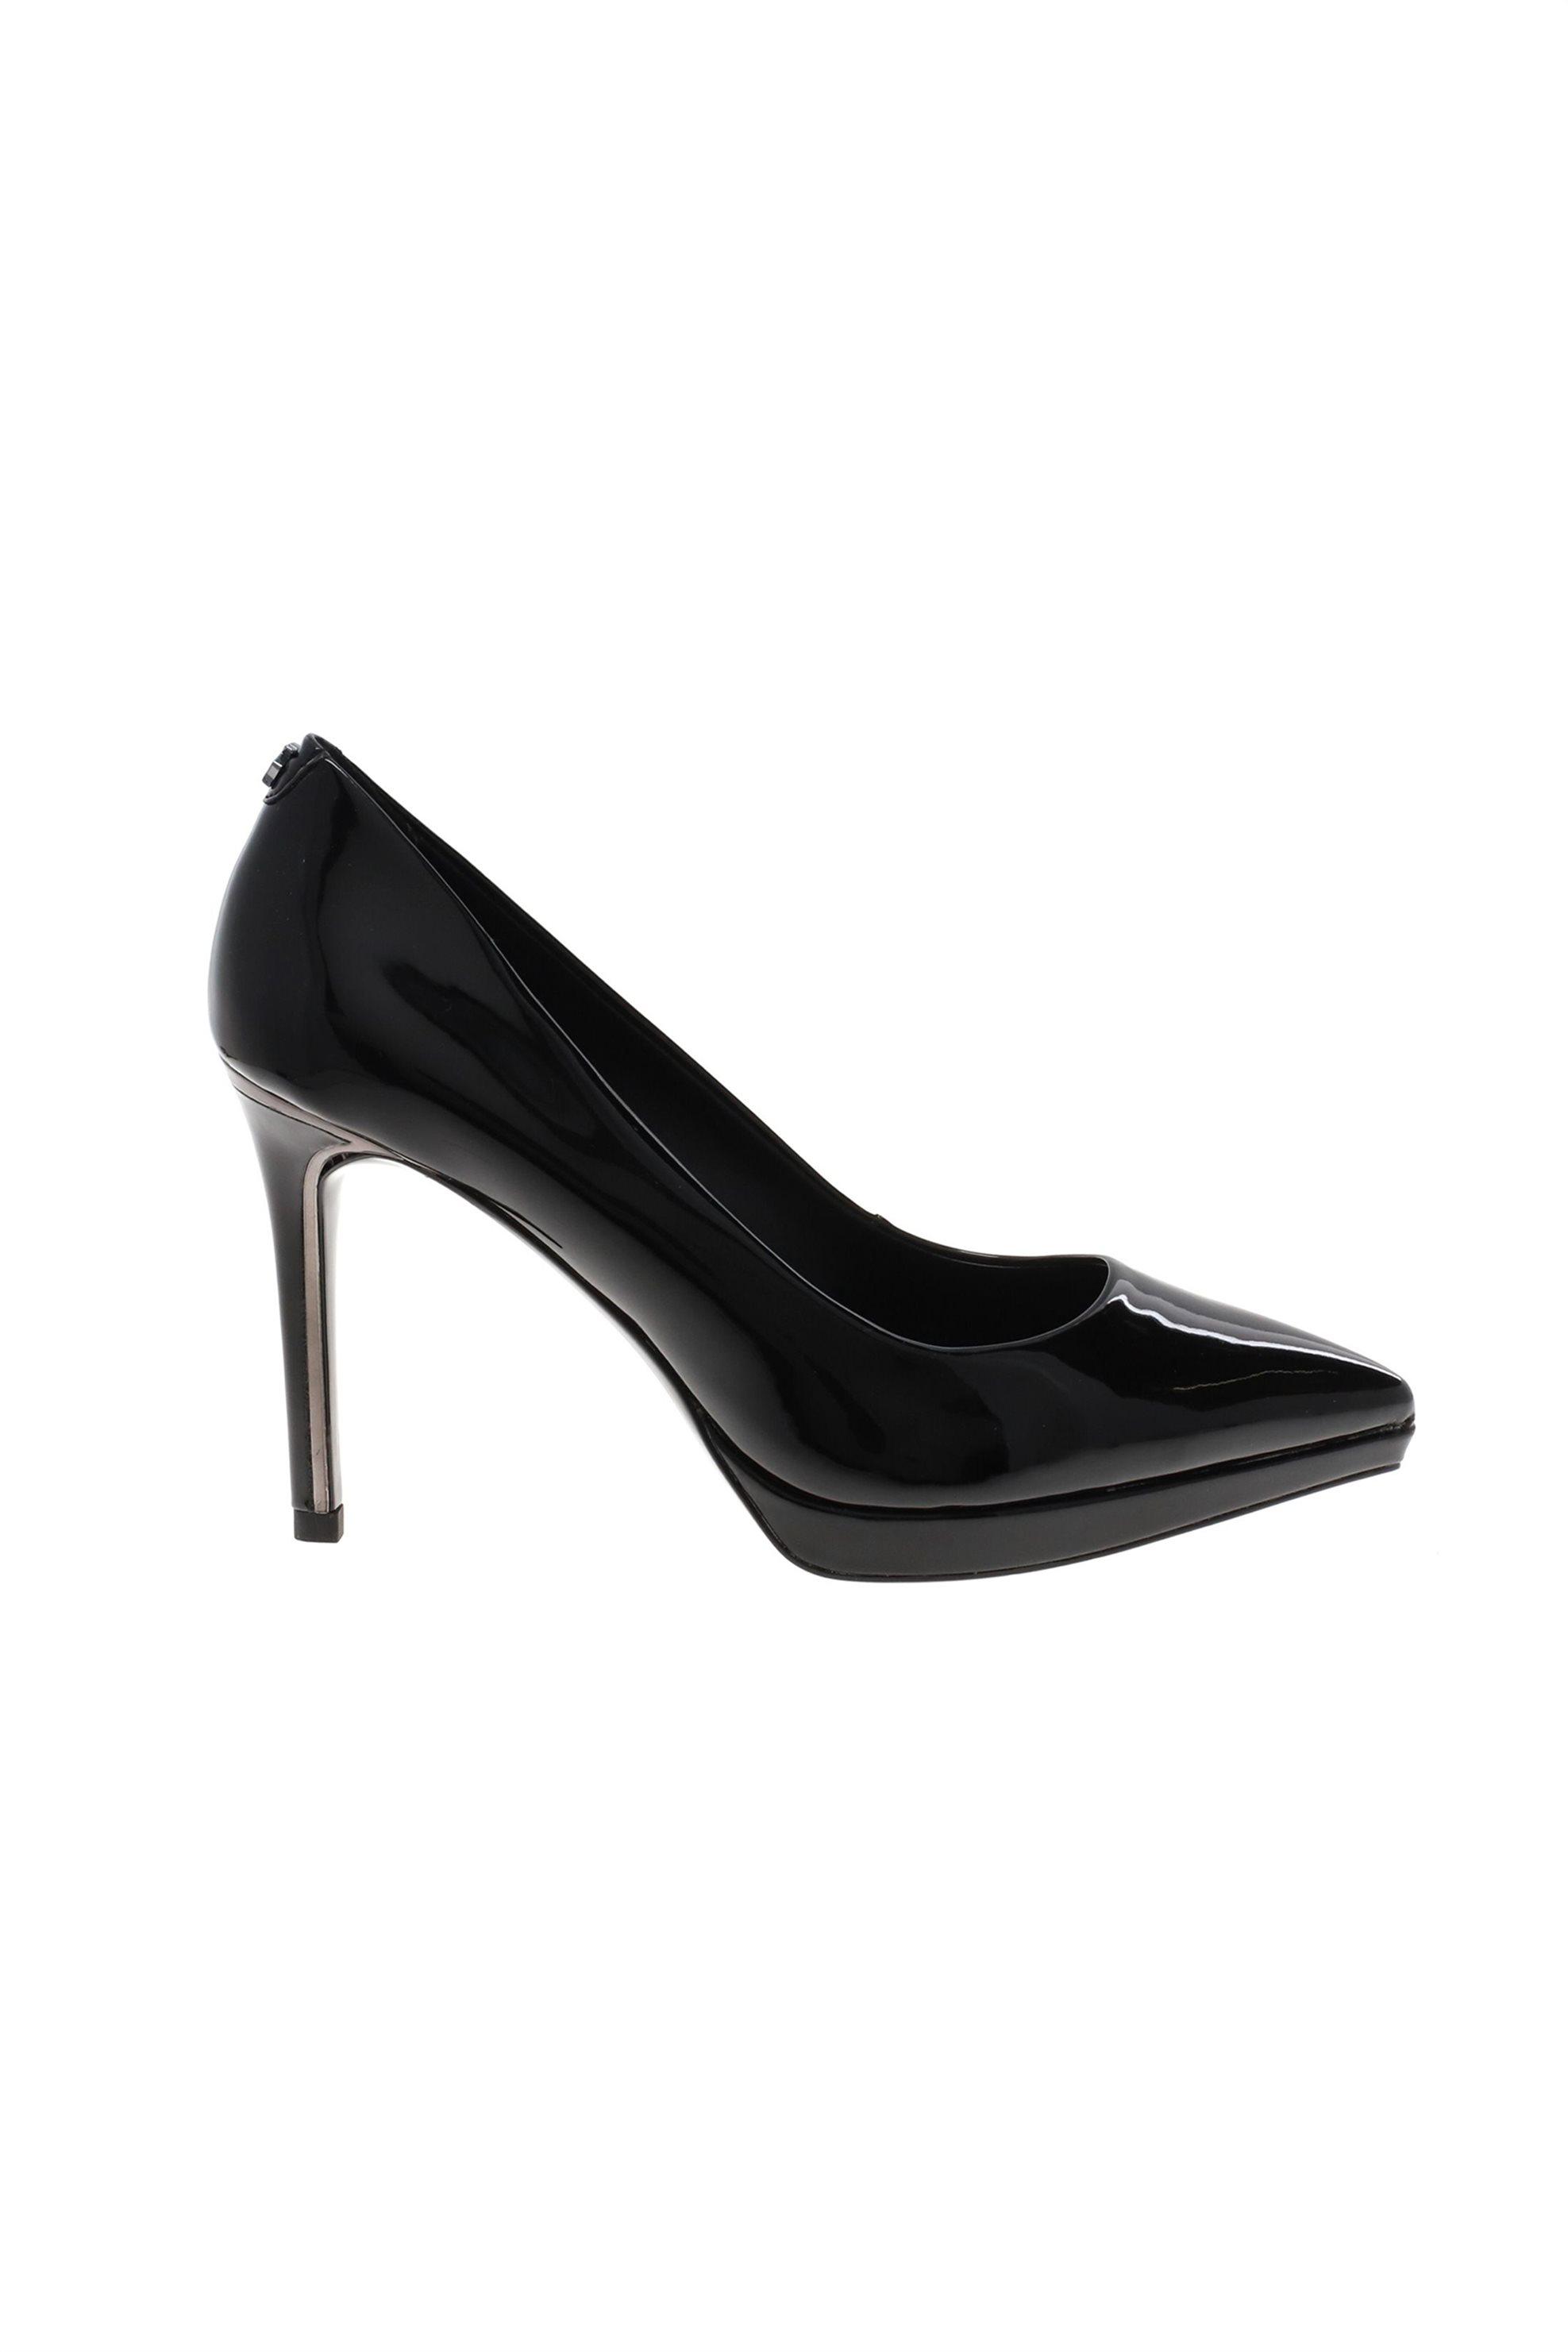 DKNY γυναικεία ψηλοτάκουνη γόβα λουστρίνι μονόχρωμη » Lexi – High Pump» – K2986311 – Μαύρο